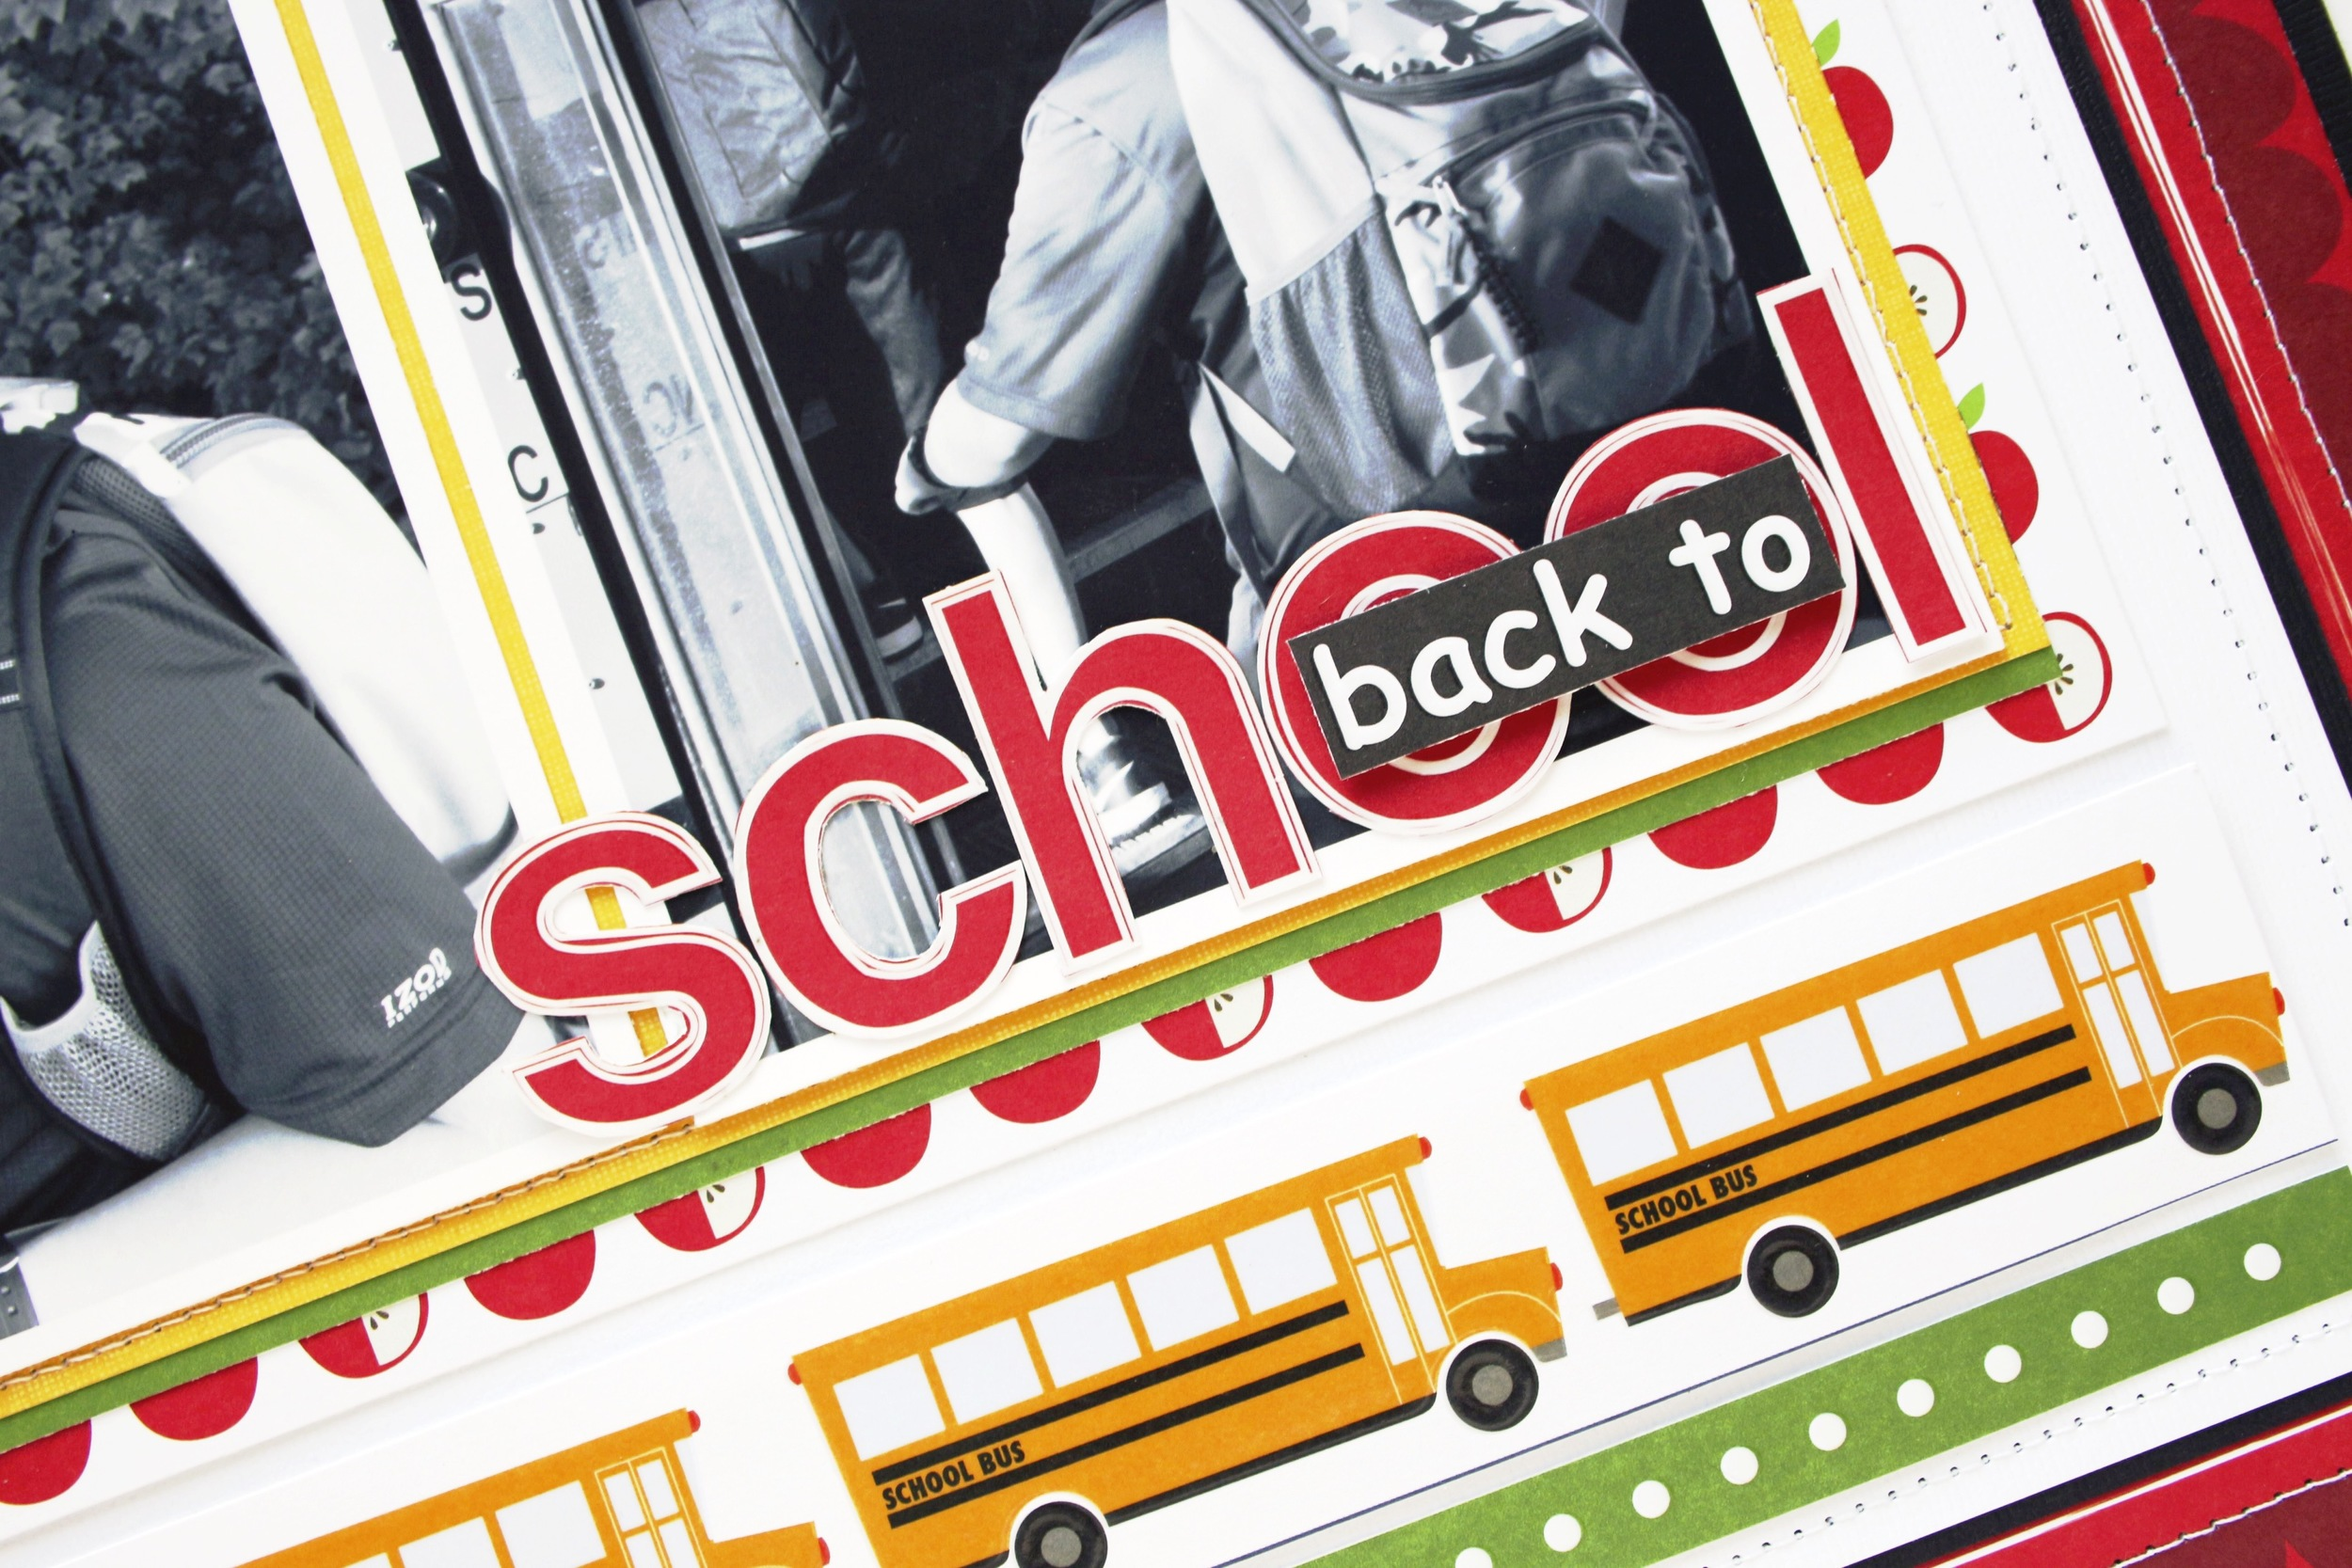 'back to school' scrapbook page oy Design Team member Mary-Ann Maldonado